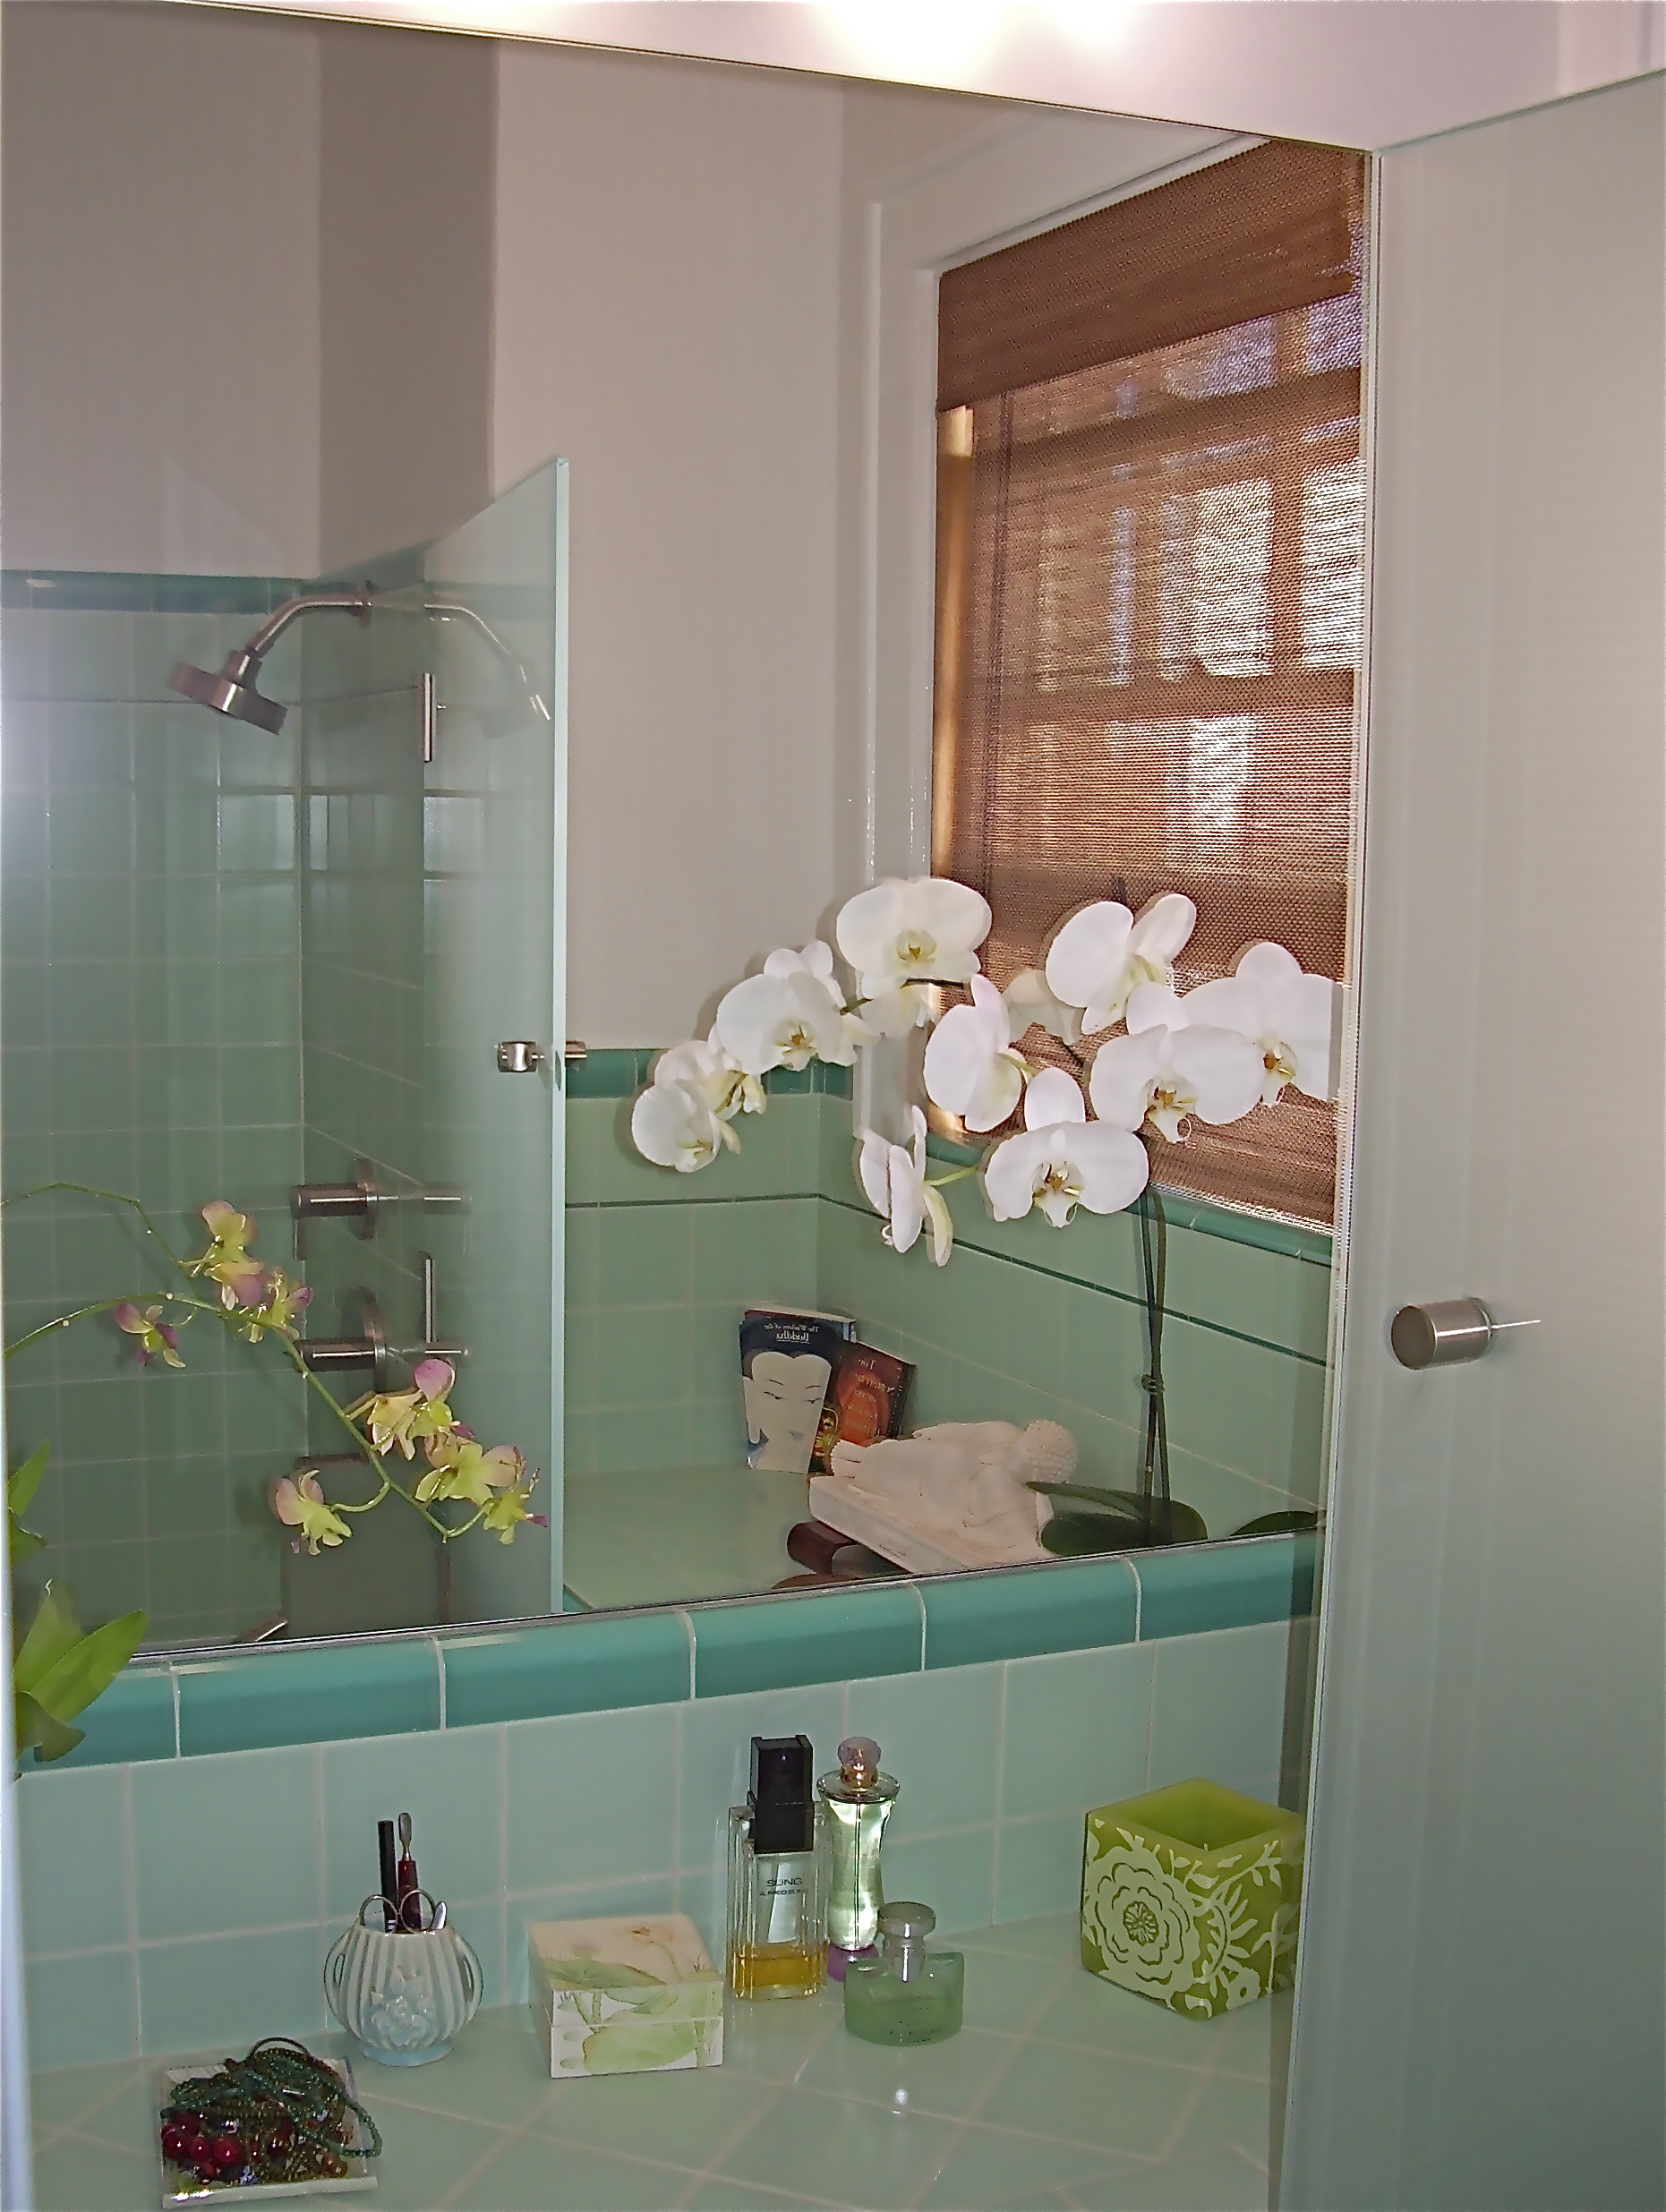 EAB Point Loma Bathroom Remodel 7.JPG